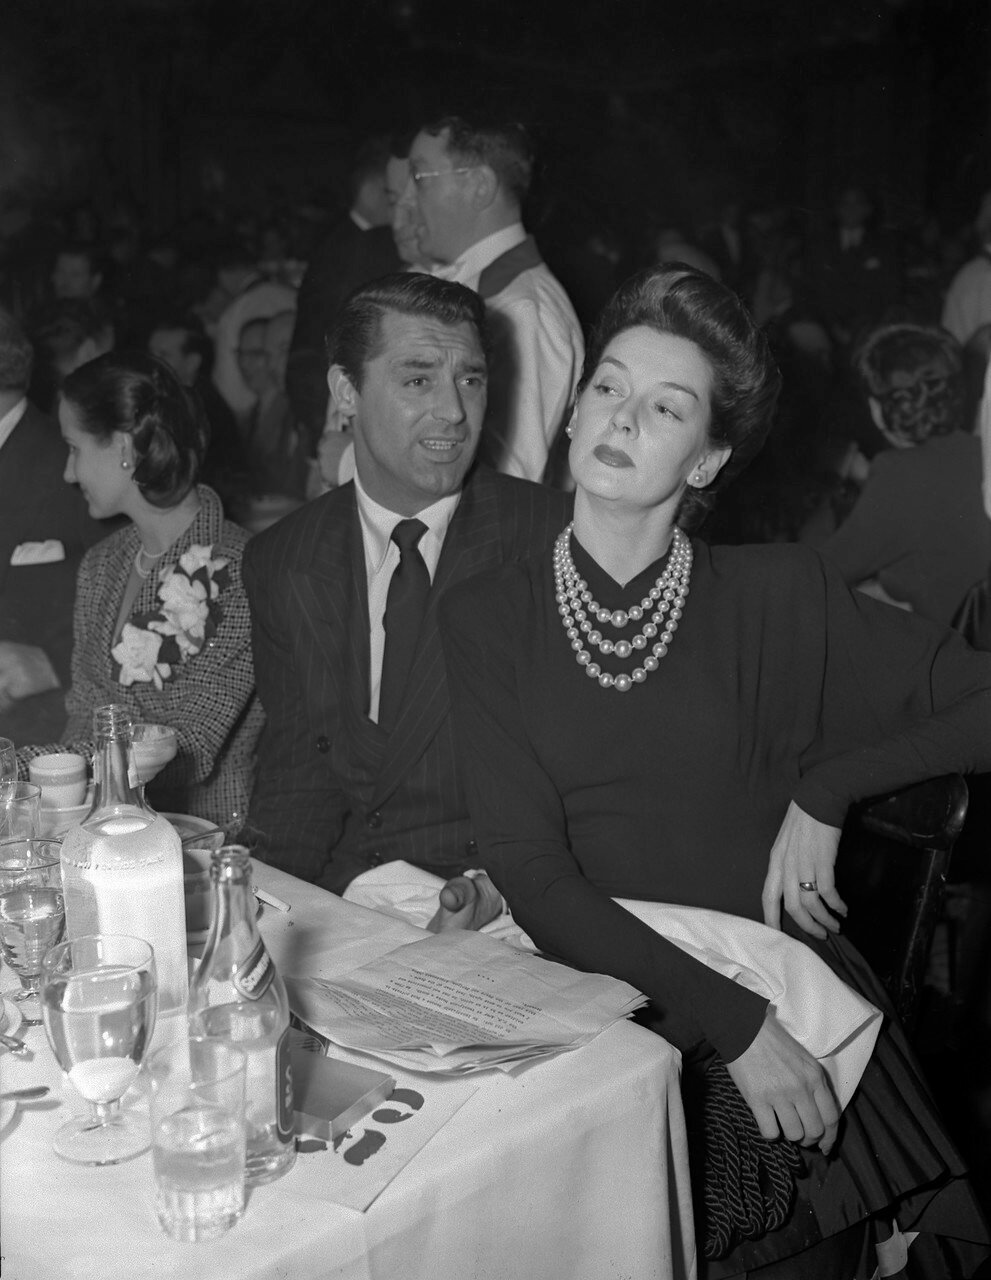 1942. Номинант на премию Кэри Грант за фильм «Грошовая серенада» (Penny Serenade) и Розалинд Расселл